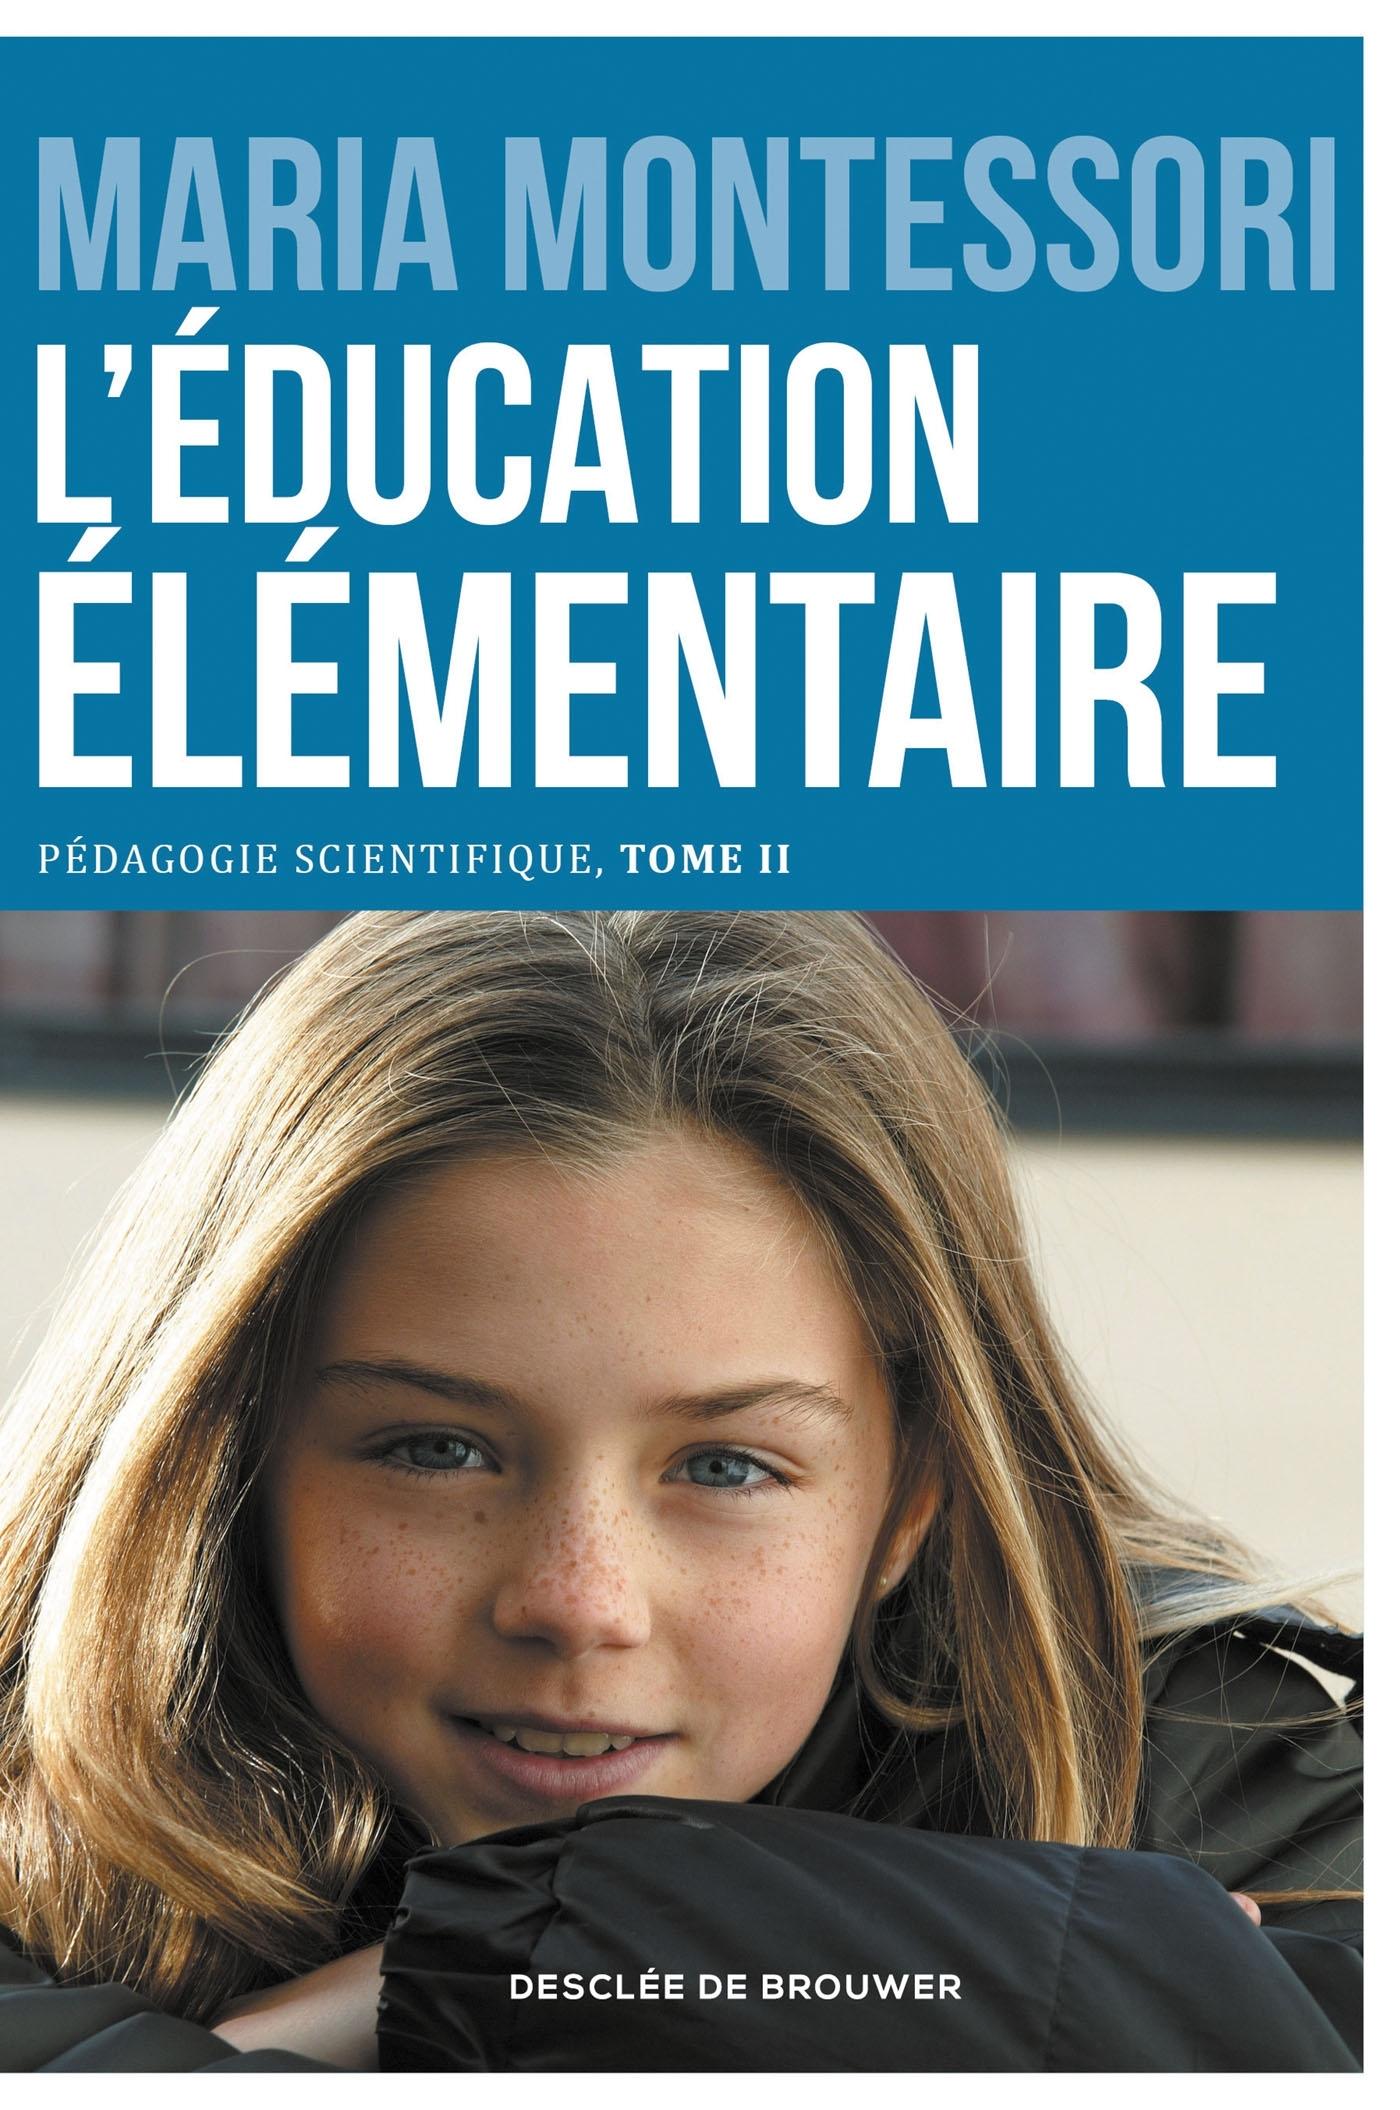 L'EDUCATION ELEMENTAIRE - PEDAGOGIE SCIENTIFIQUE, TOME II